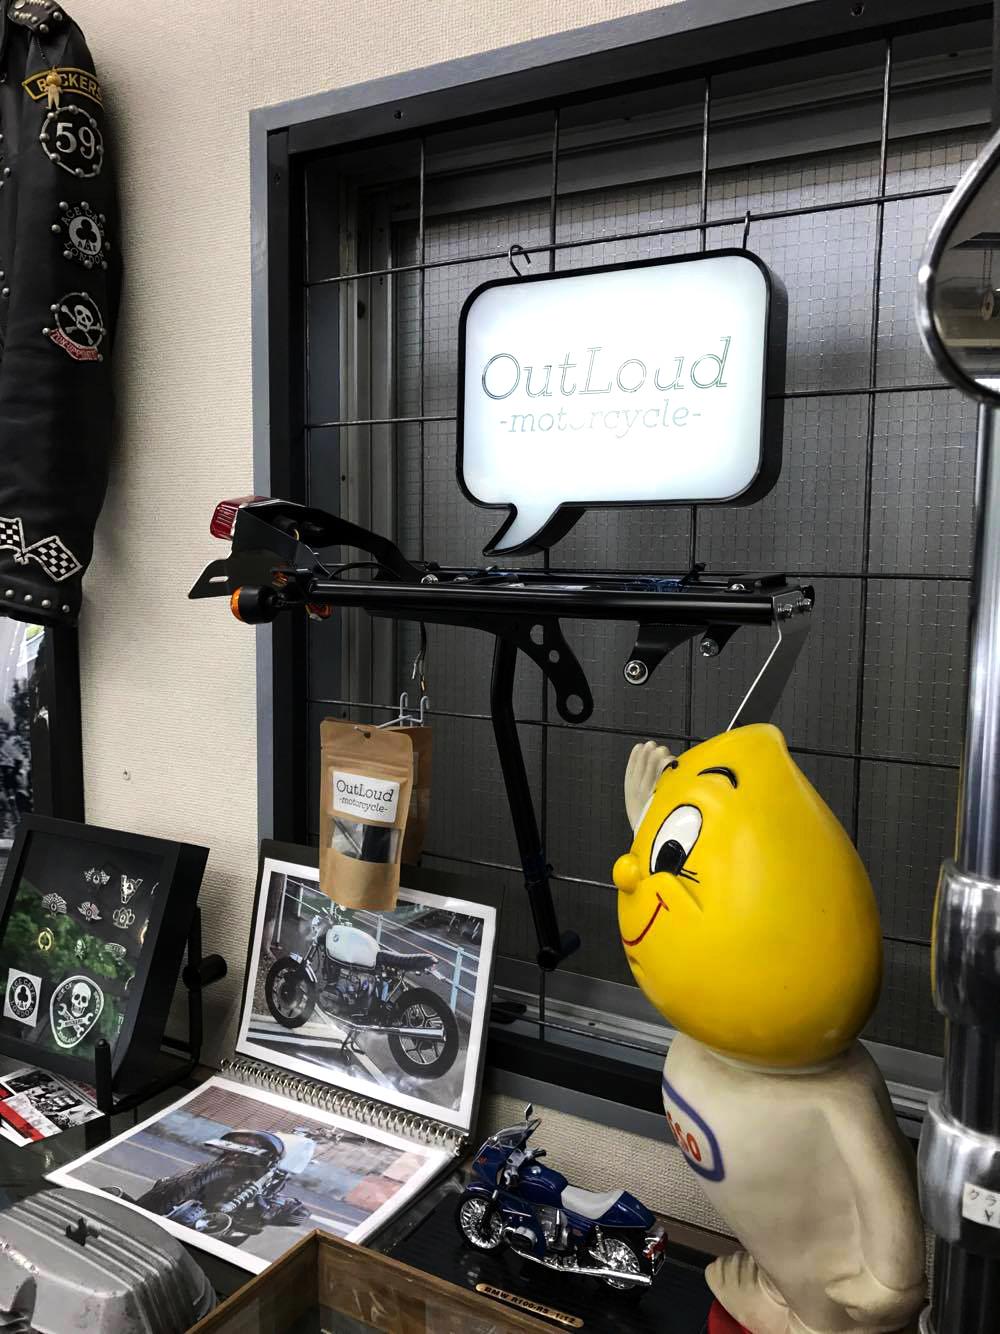 OutLoudオリジナル R100RS カスタムパーツの展示写真